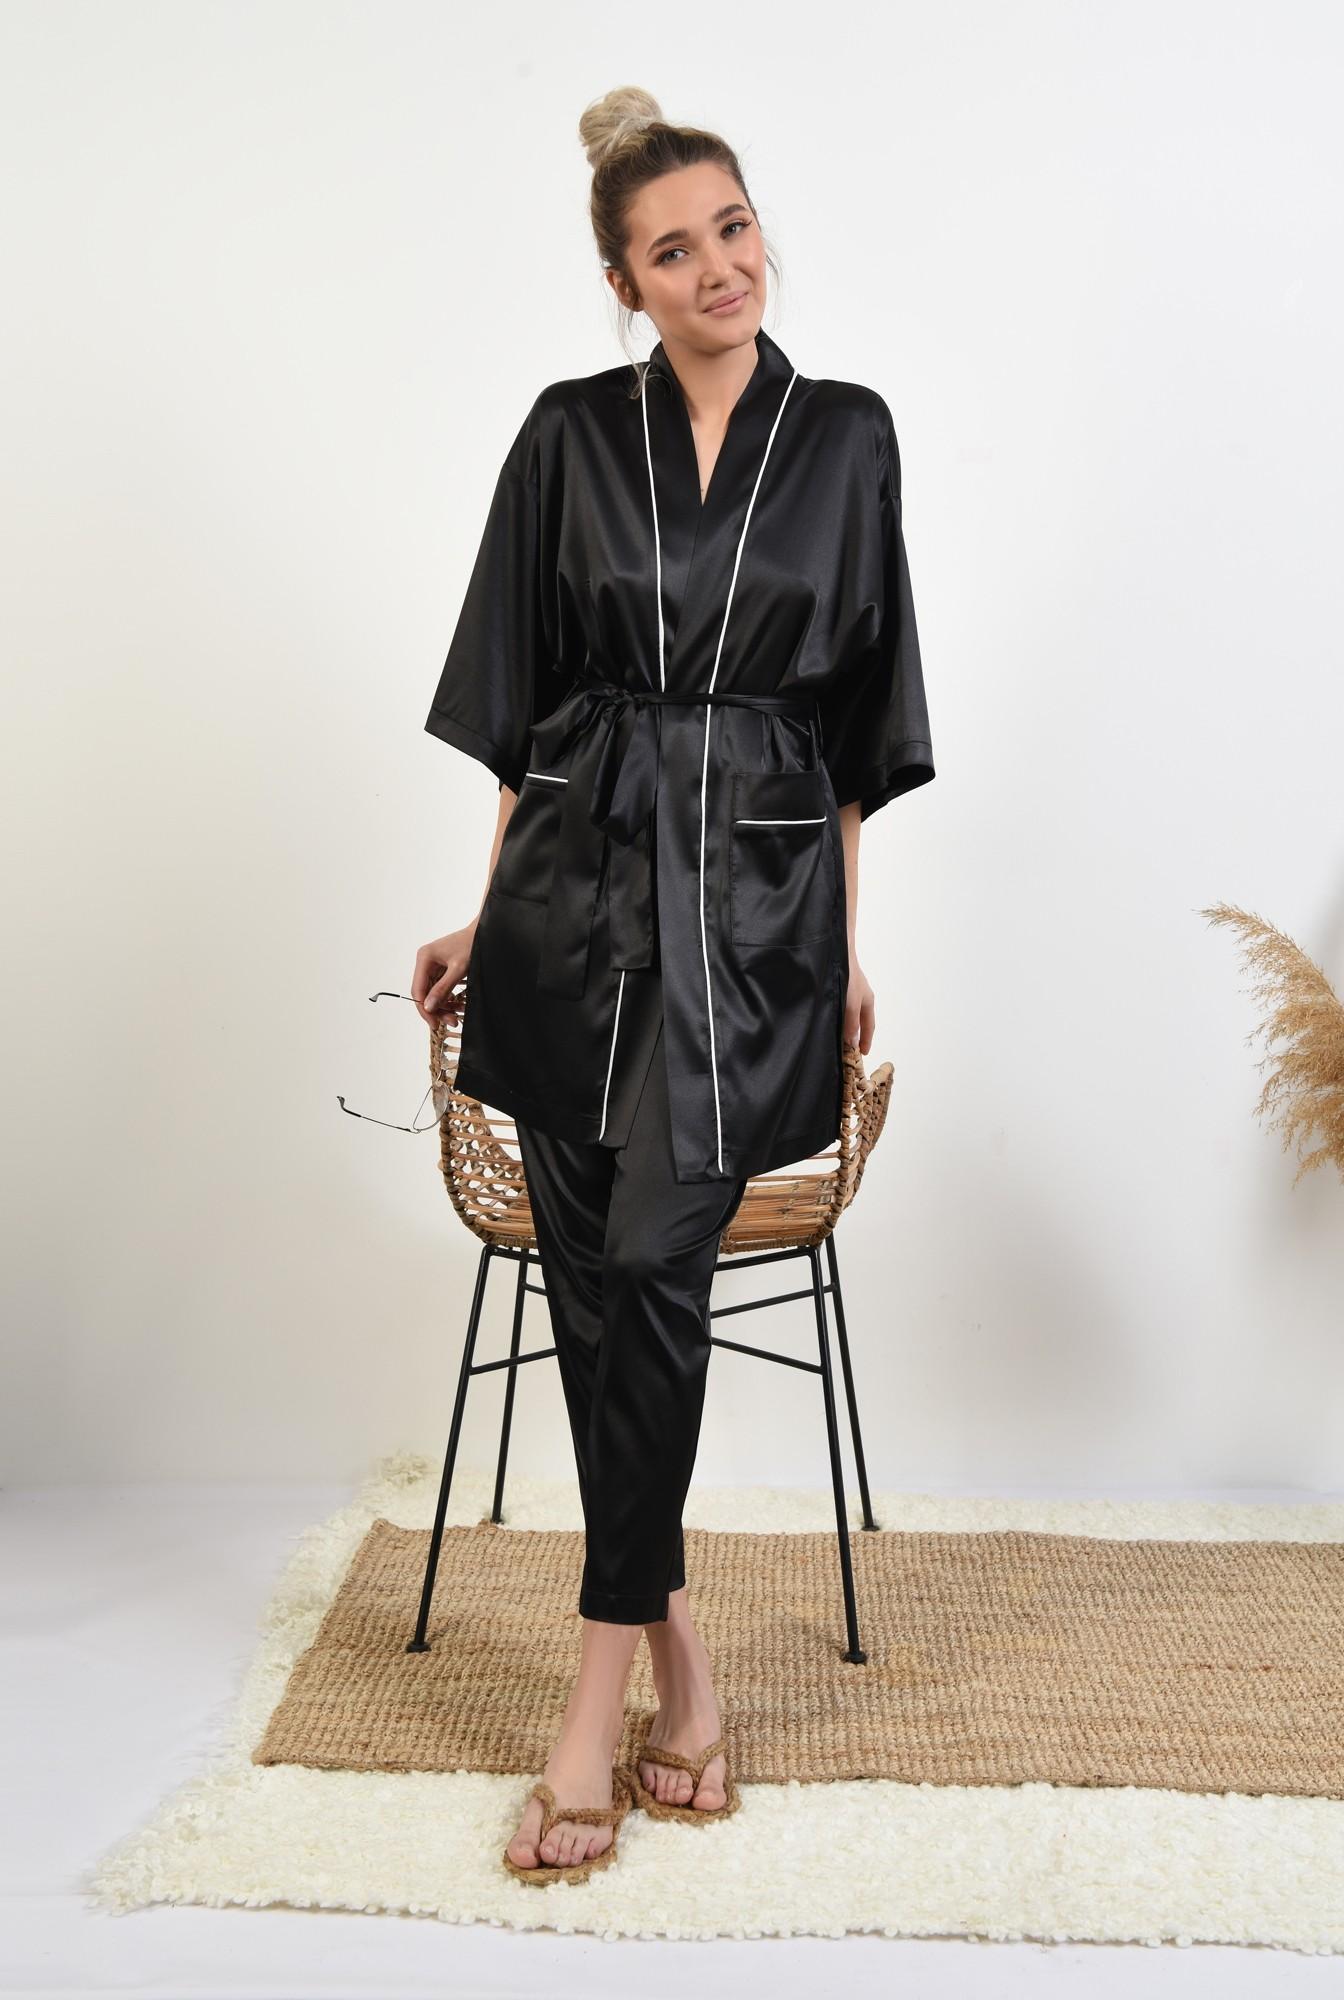 360 - pantaloni din satin, negri, lungi, cu funda in contrast